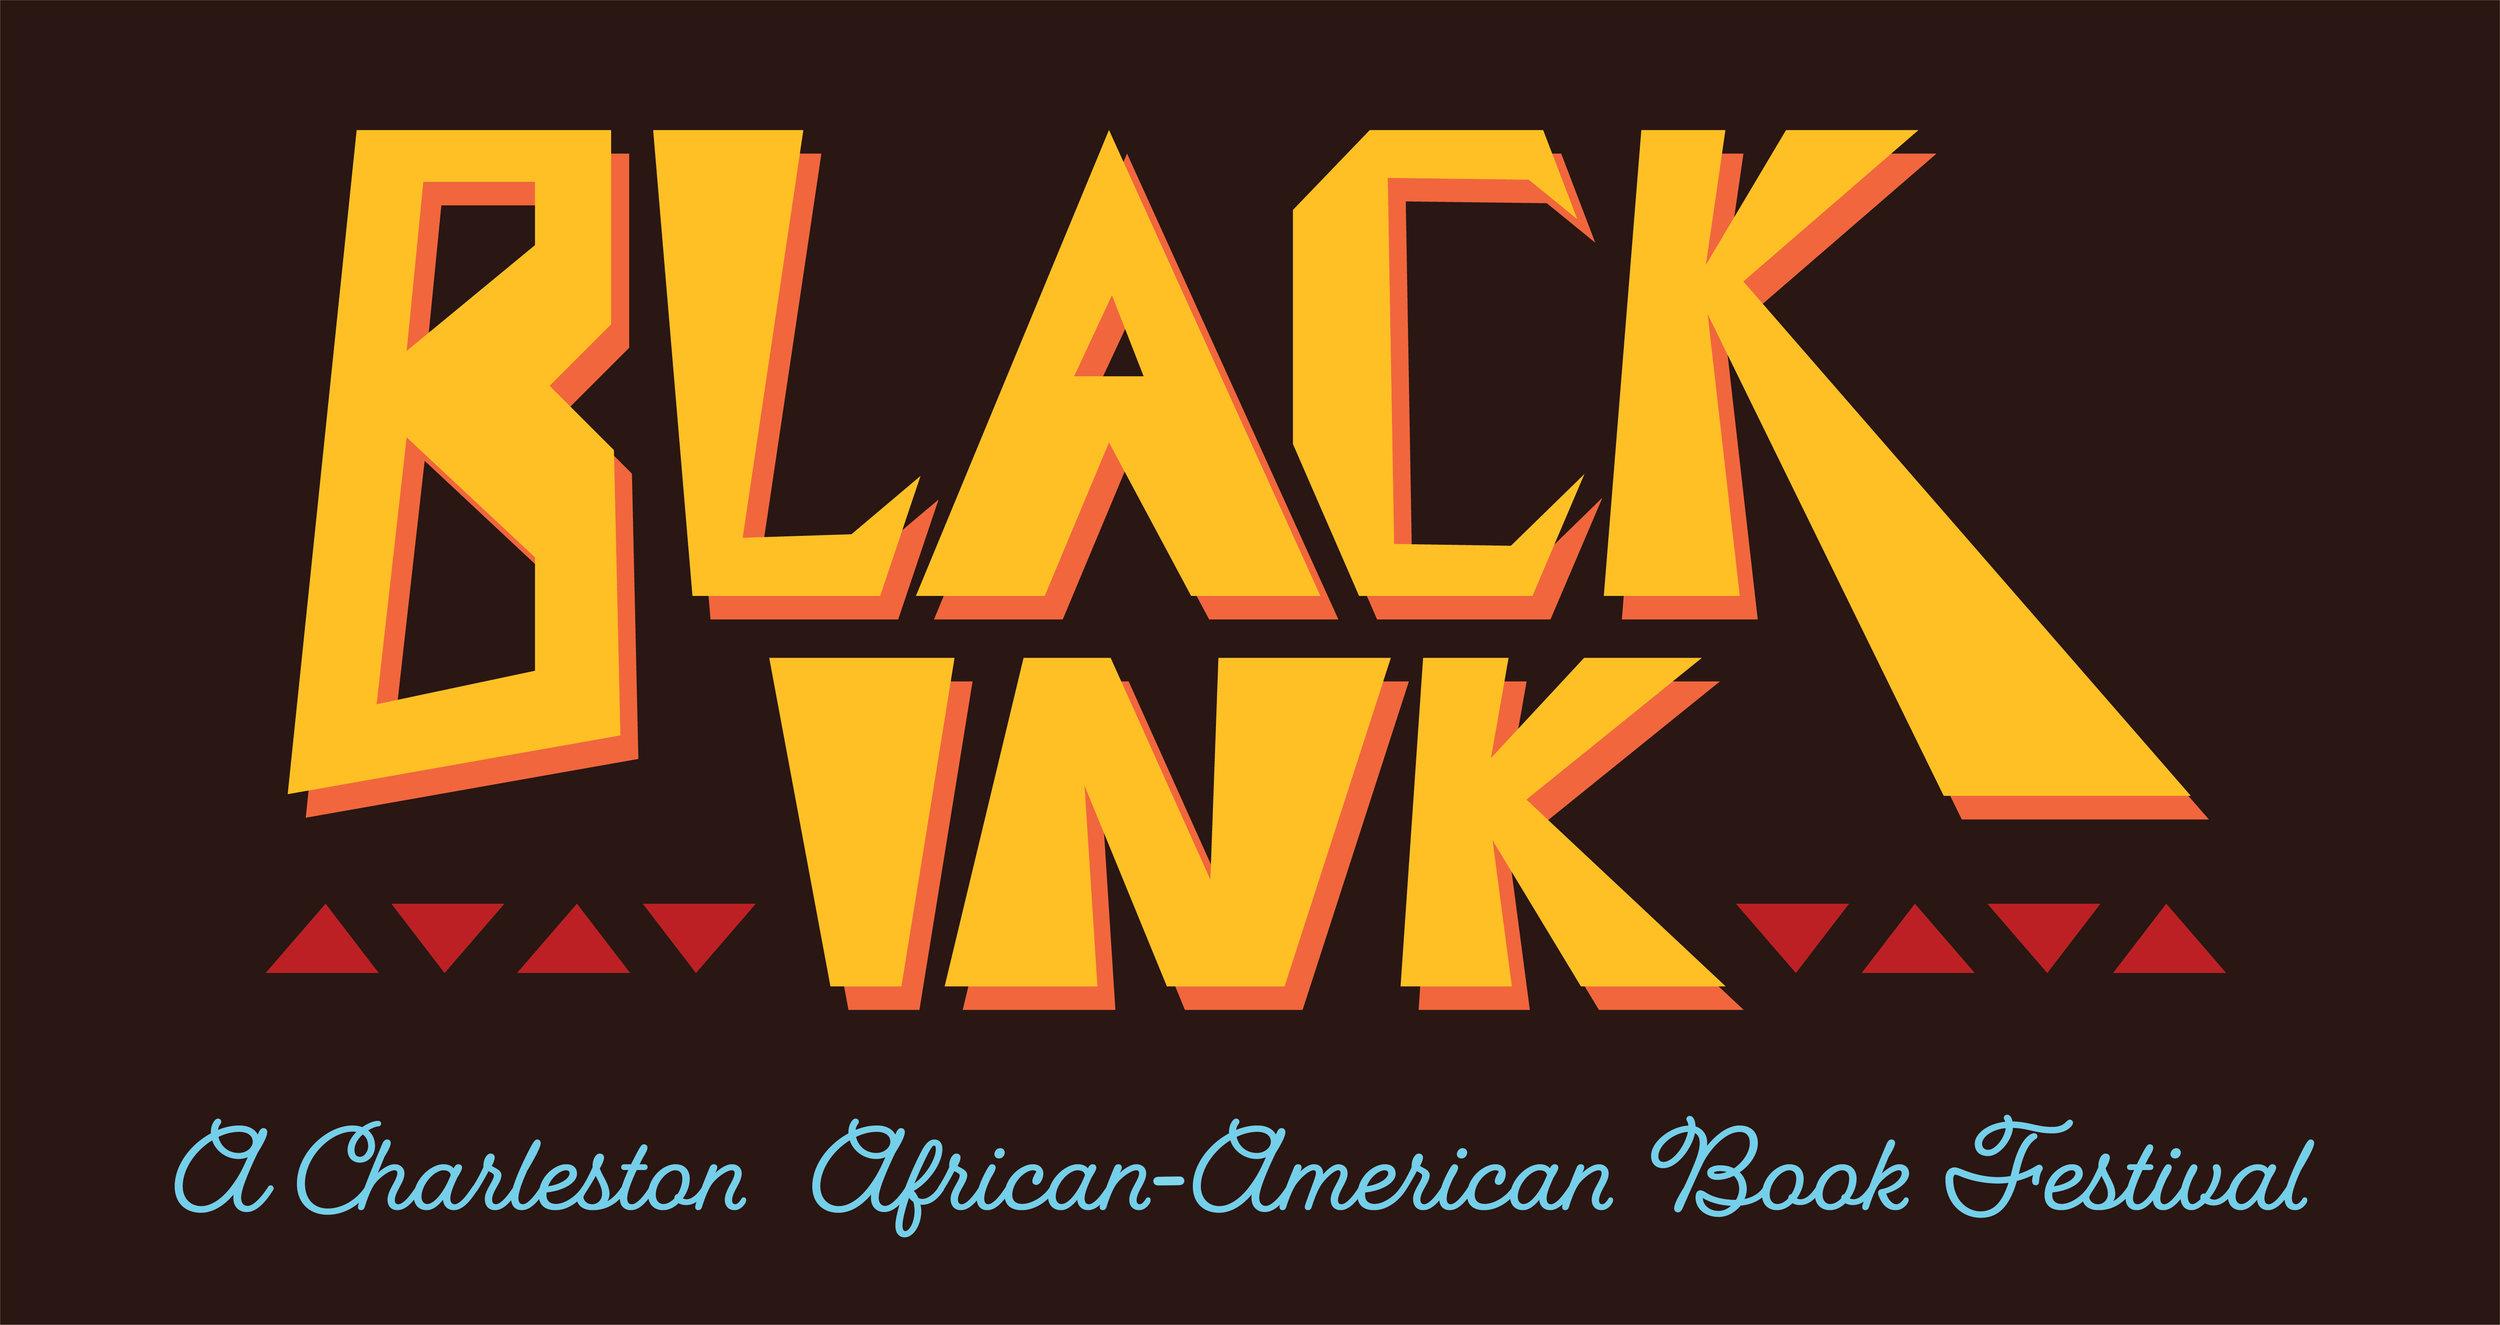 blackink-logo-2018.jpg